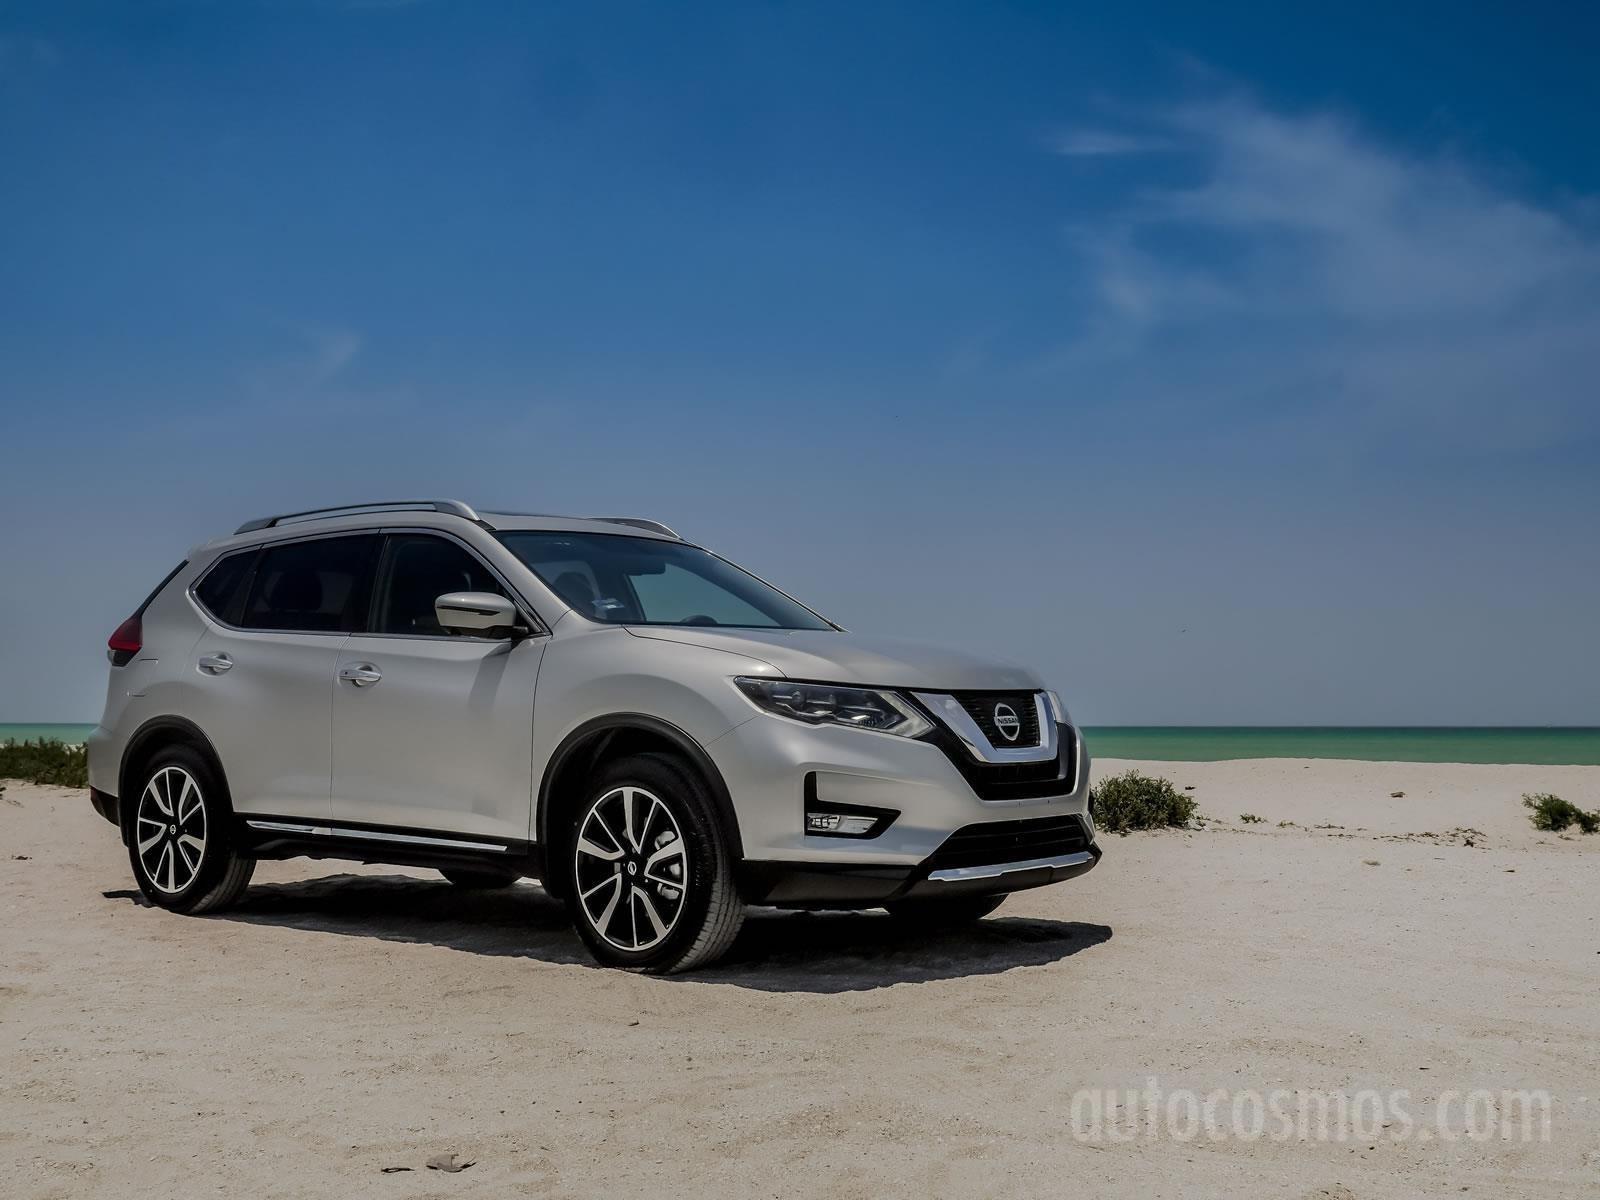 Manejamos la Nissan X-Trail 2018 - Autocosmos.com